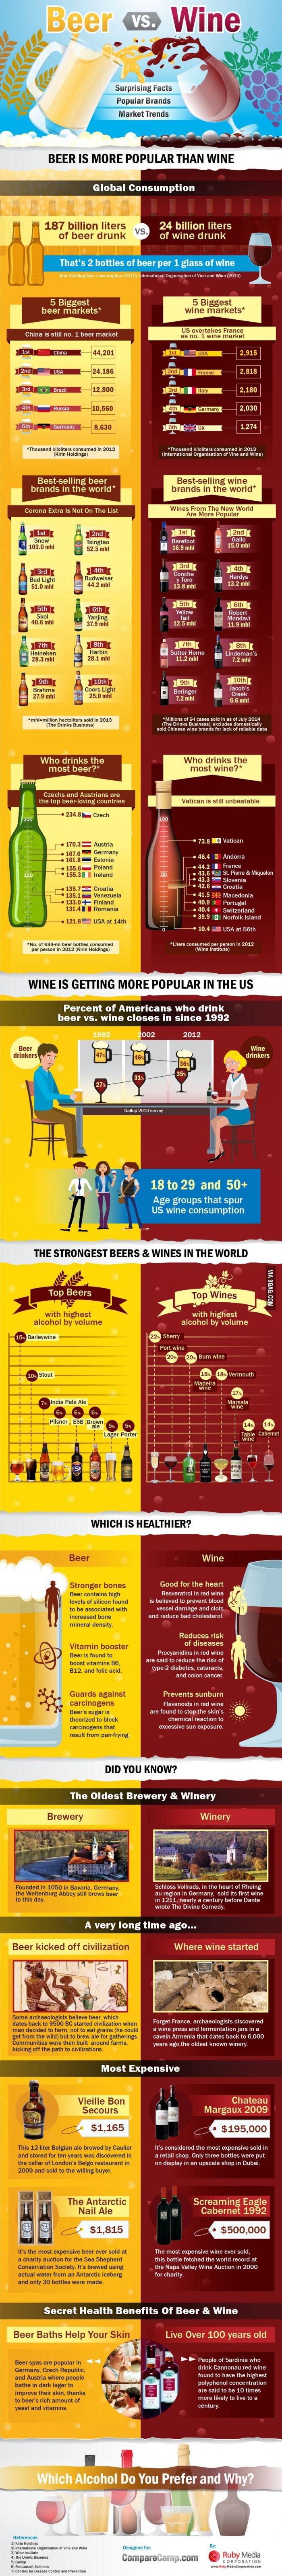 Beer Vs. Wine